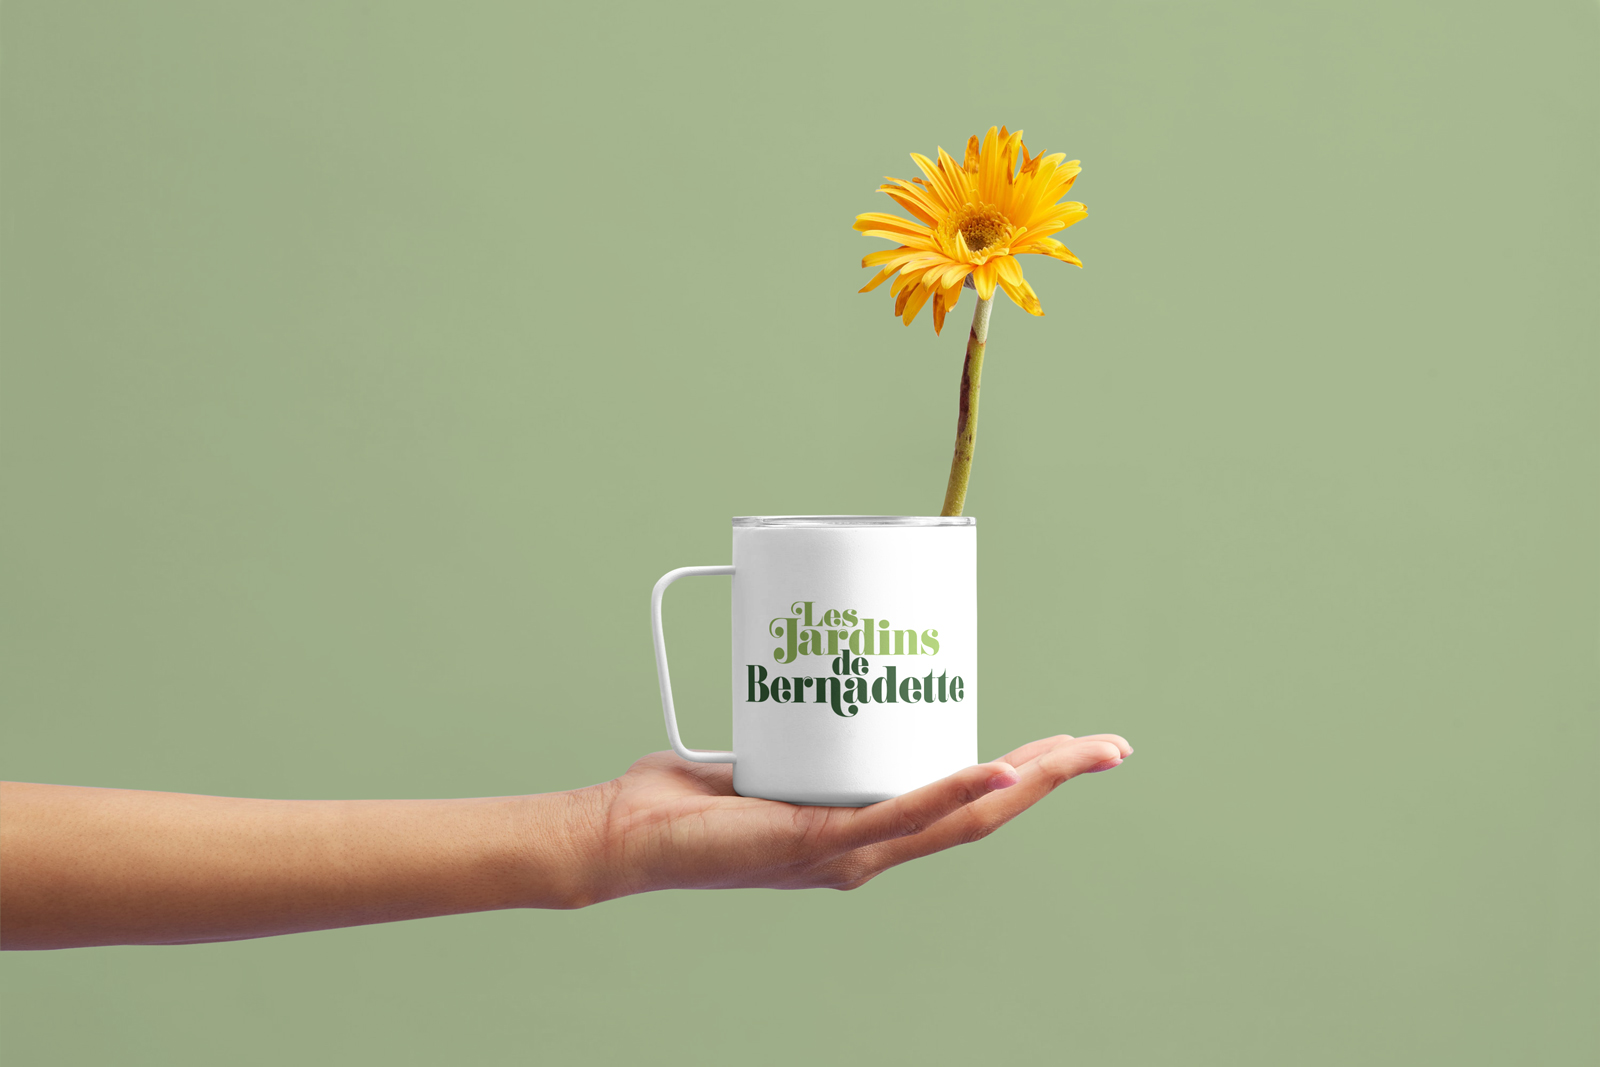 Les-jardins-de-Bernadette-mug-projet-josselin tourette-2